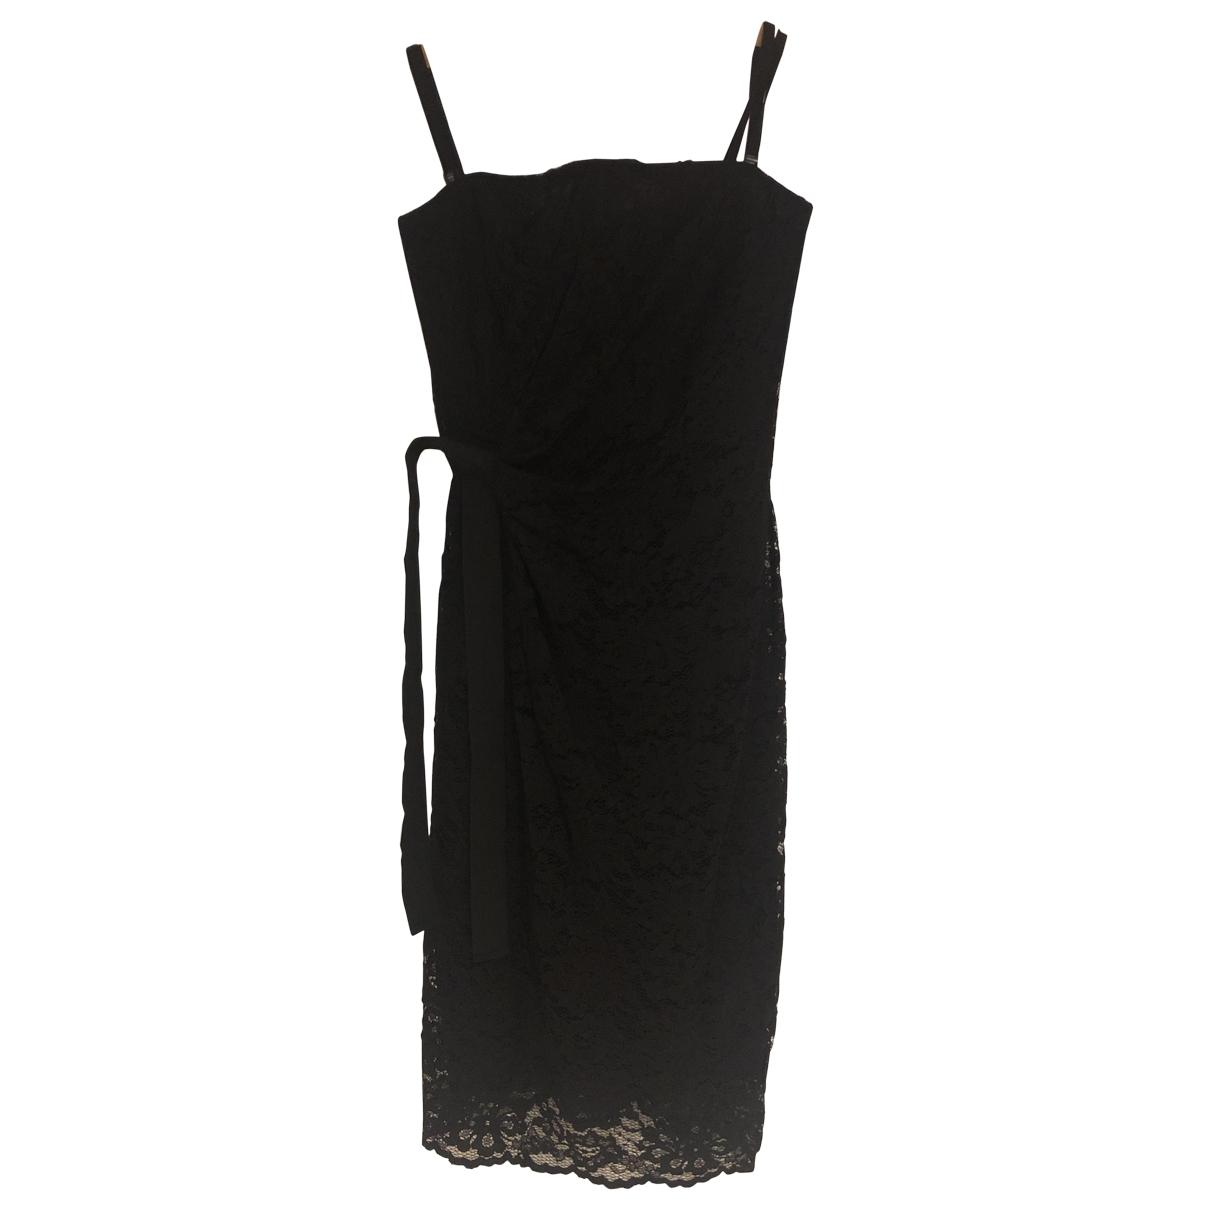 D&g \N Black Lace dress for Women 44 FR